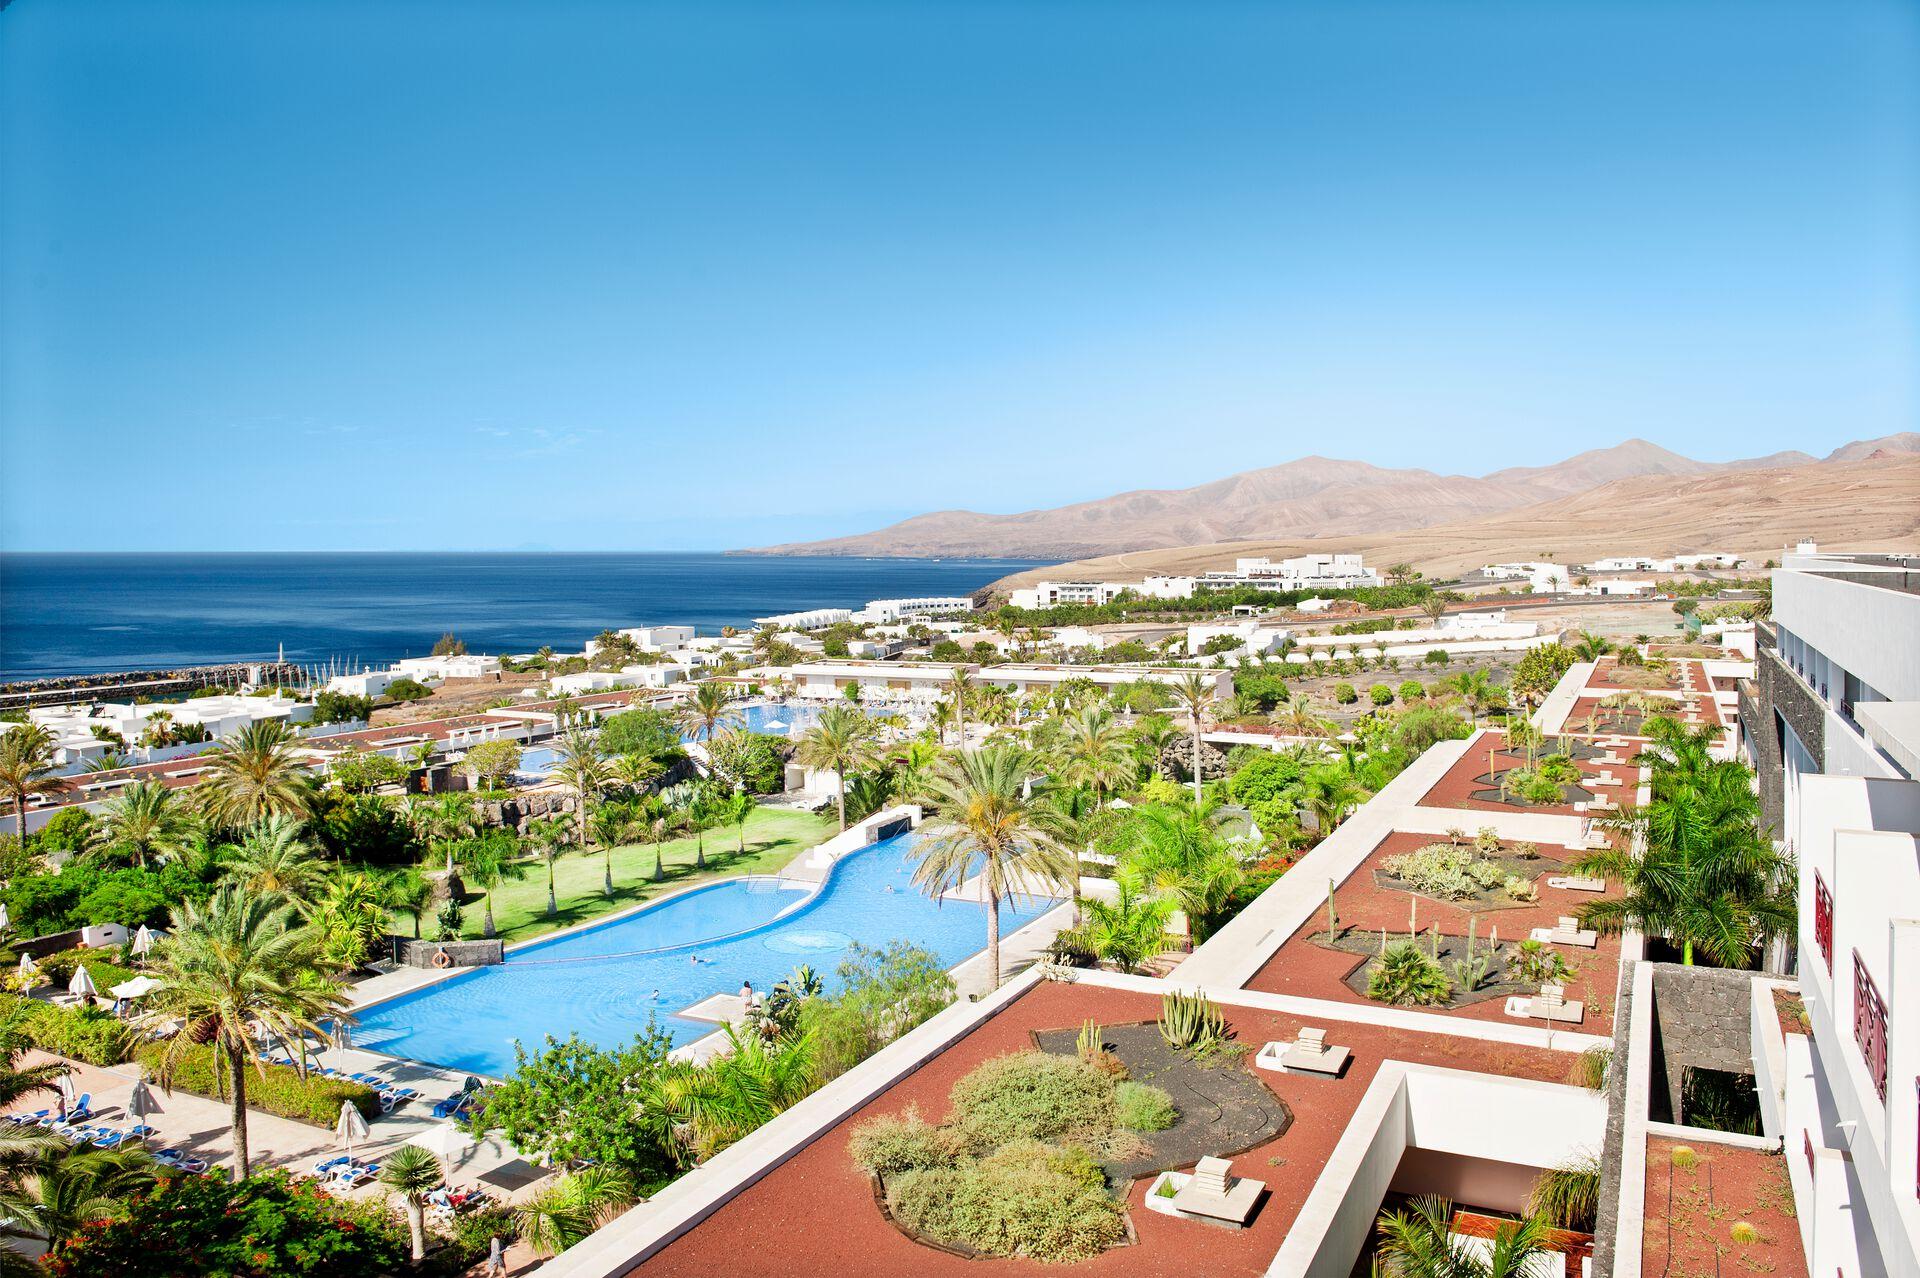 Séjour Lanzarote - Hotel Costa Calero Talaso & Spa - 4*